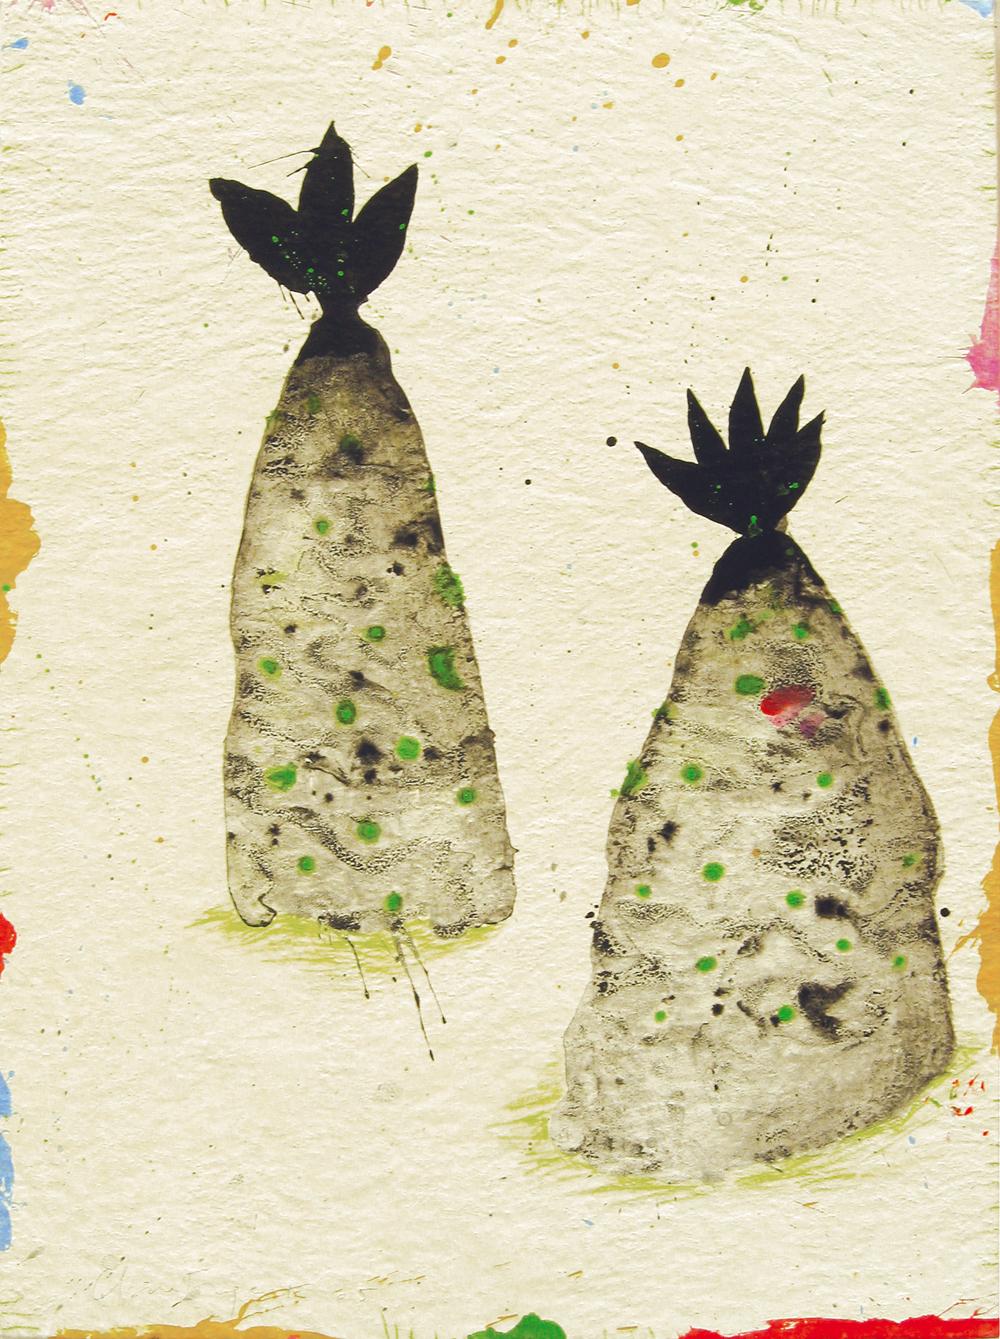 2005 - Mégalithe arborescent / Arborecent megalith n°5